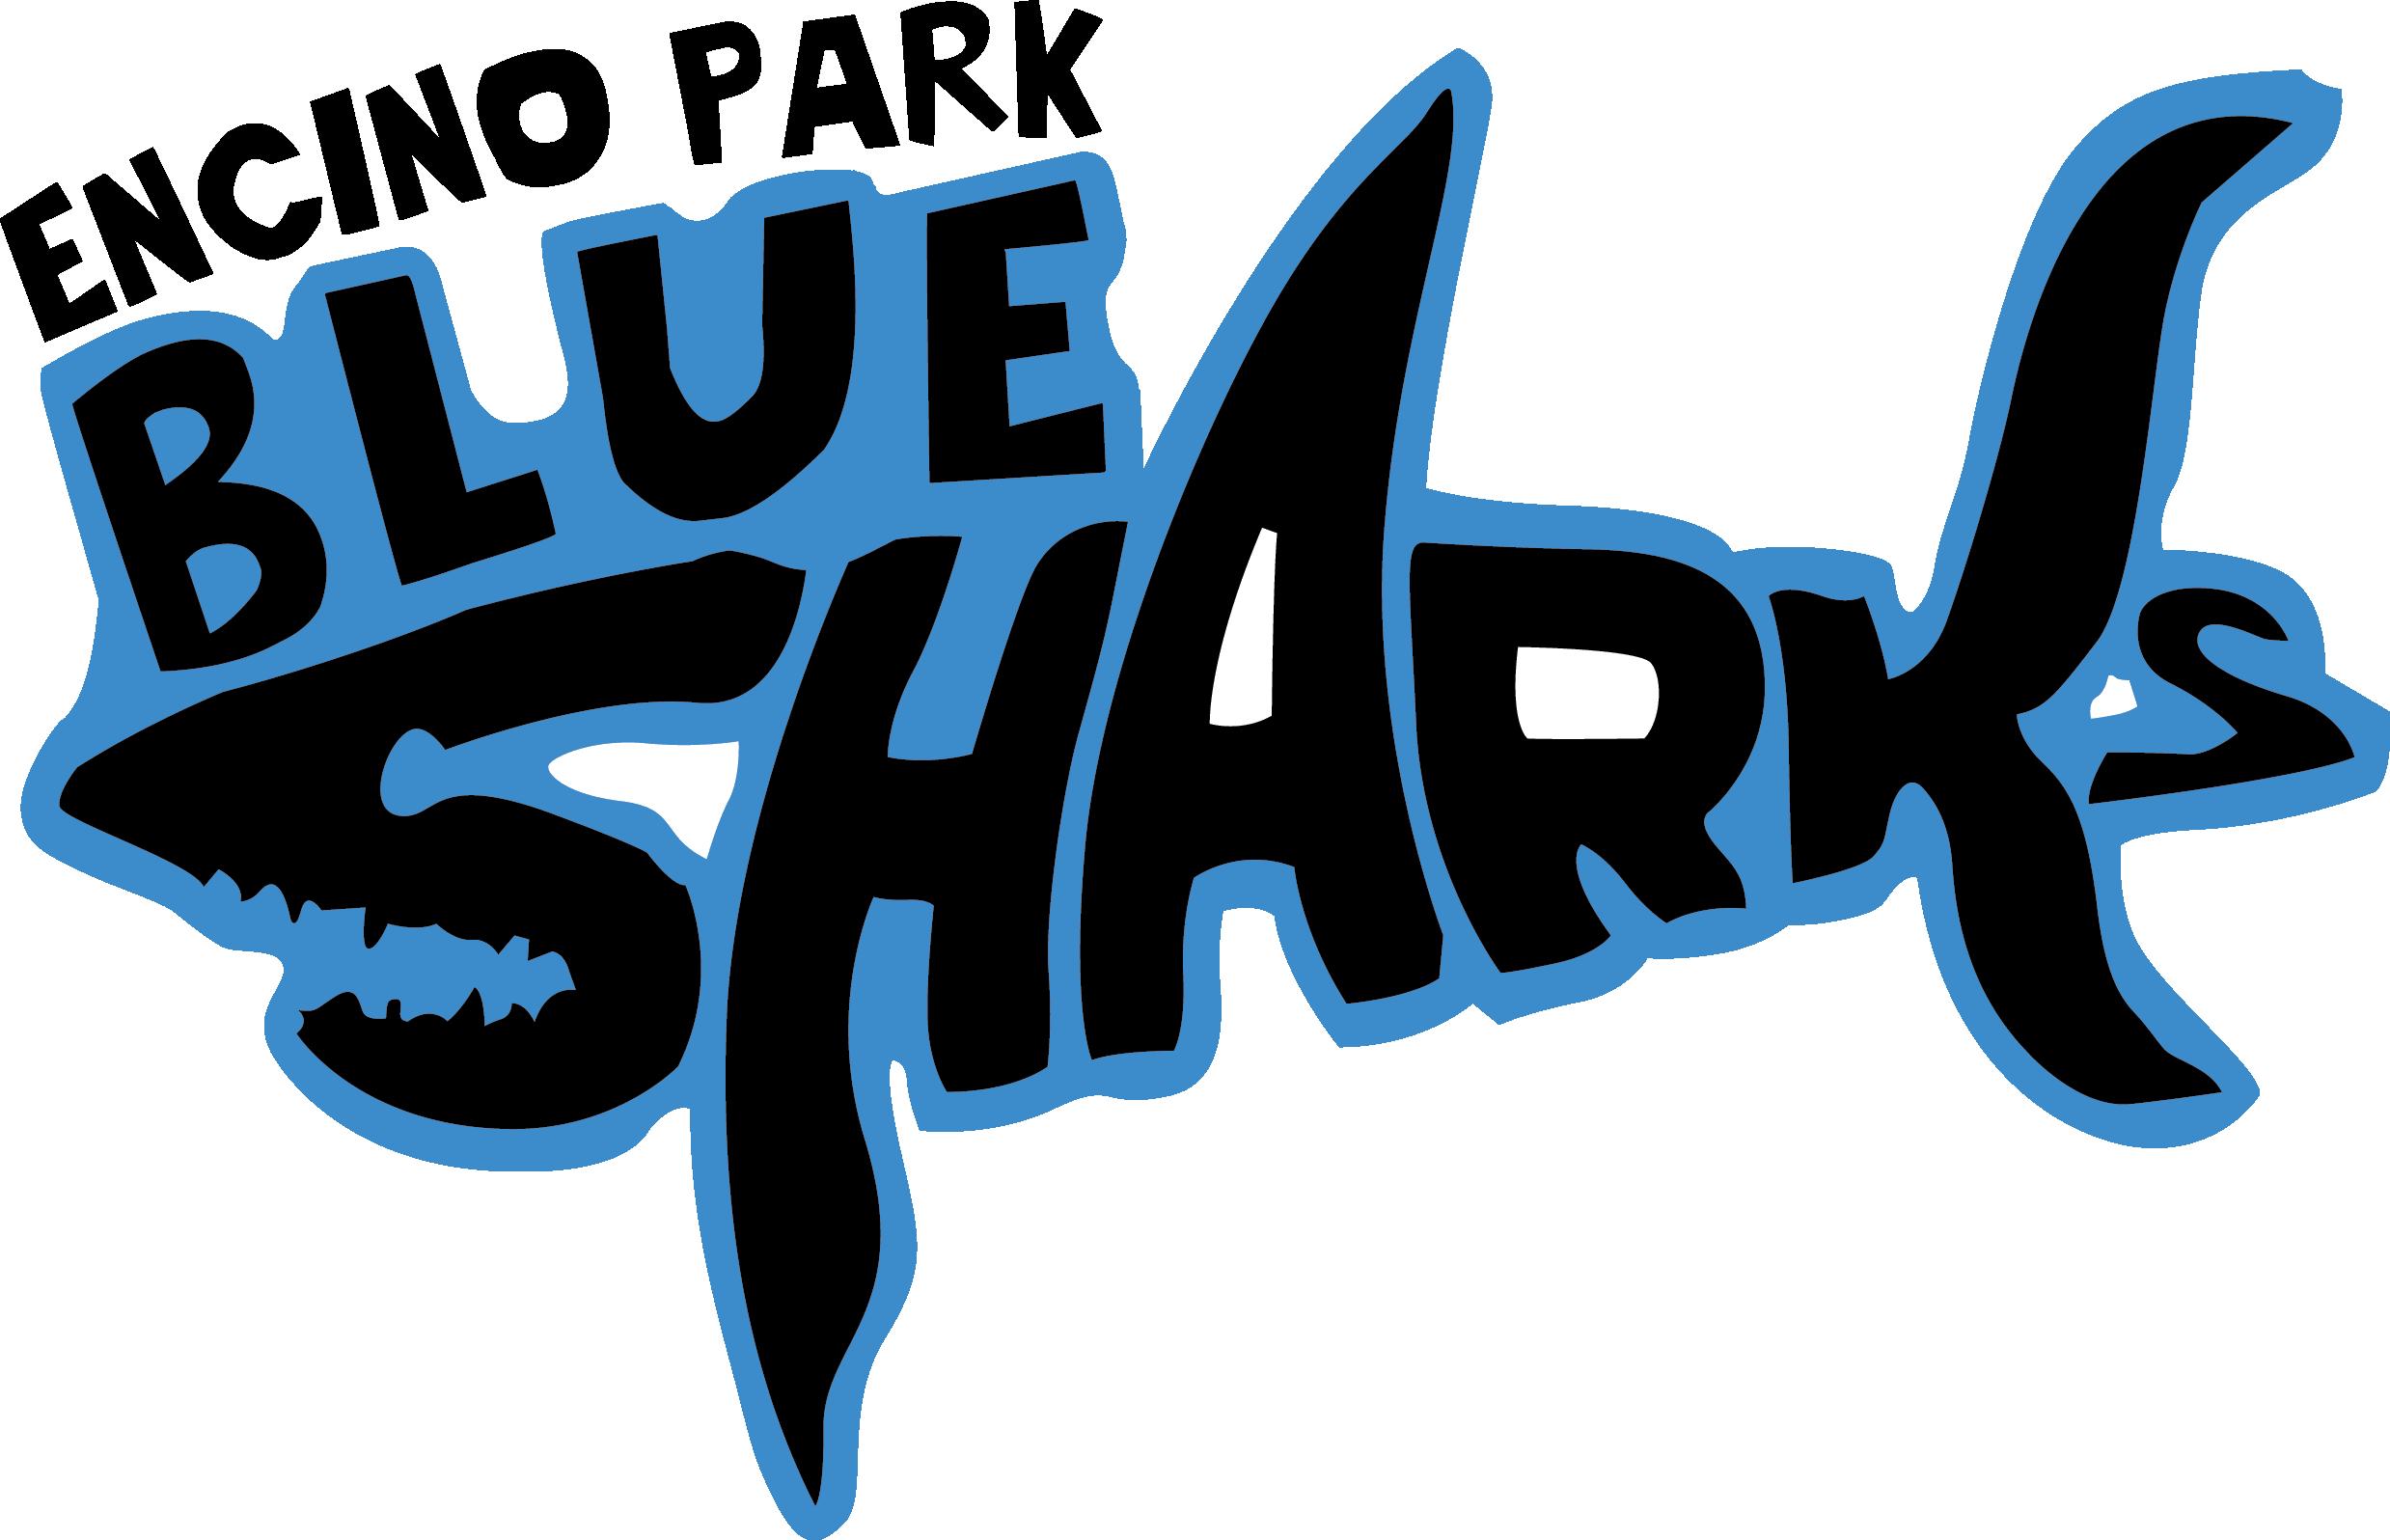 Clipart shark shark swimming. Home encino park blue